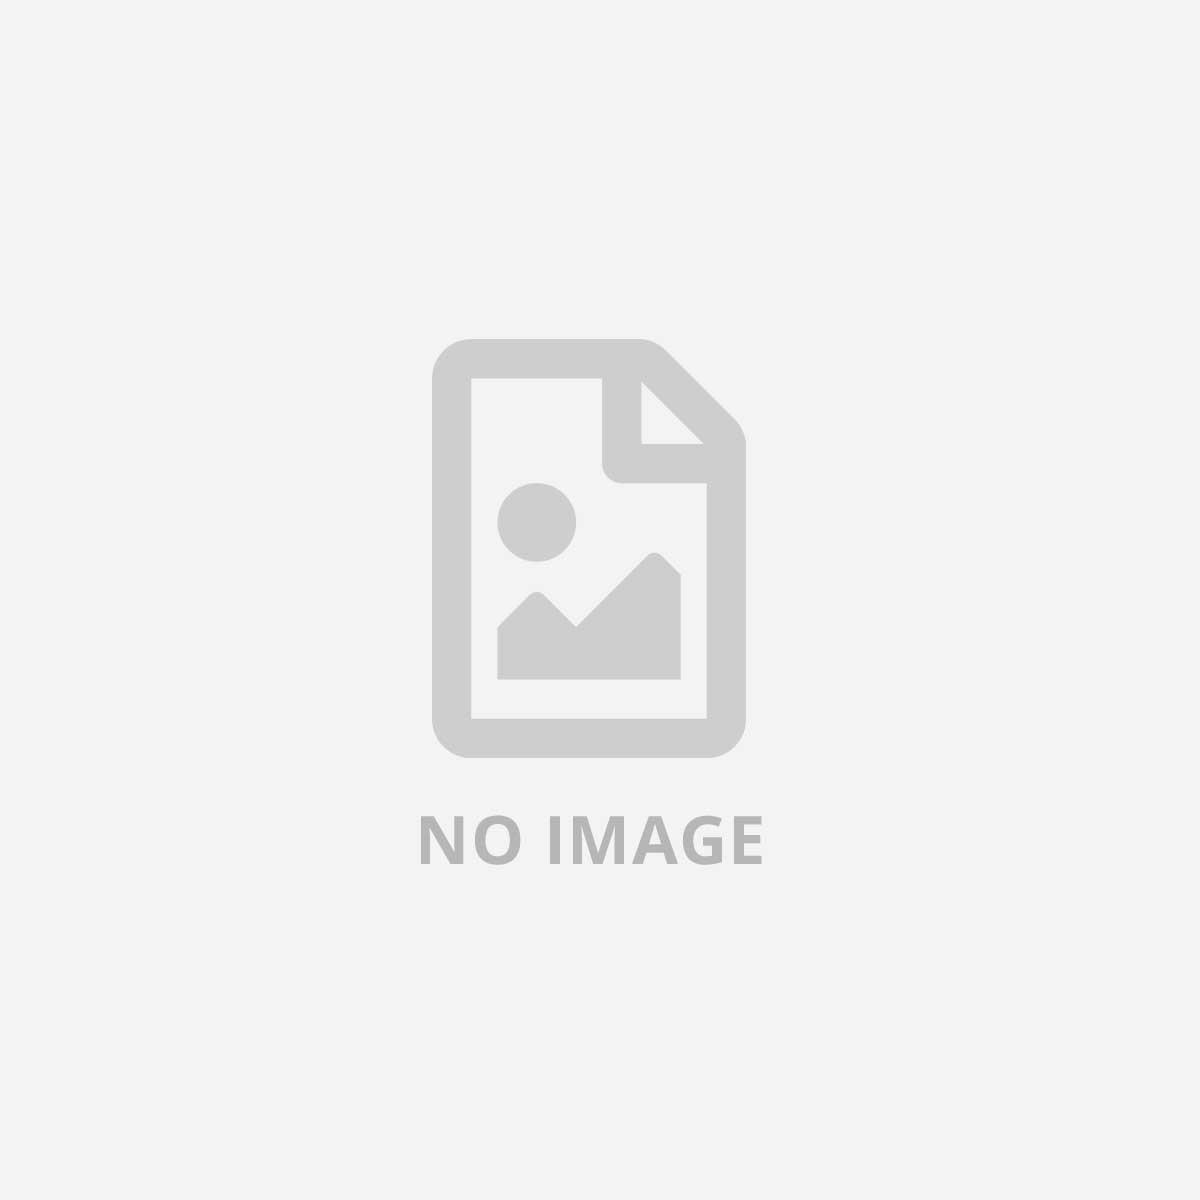 NILOX RAM DDR3 DIMM 2GB 1066MHZ CL7